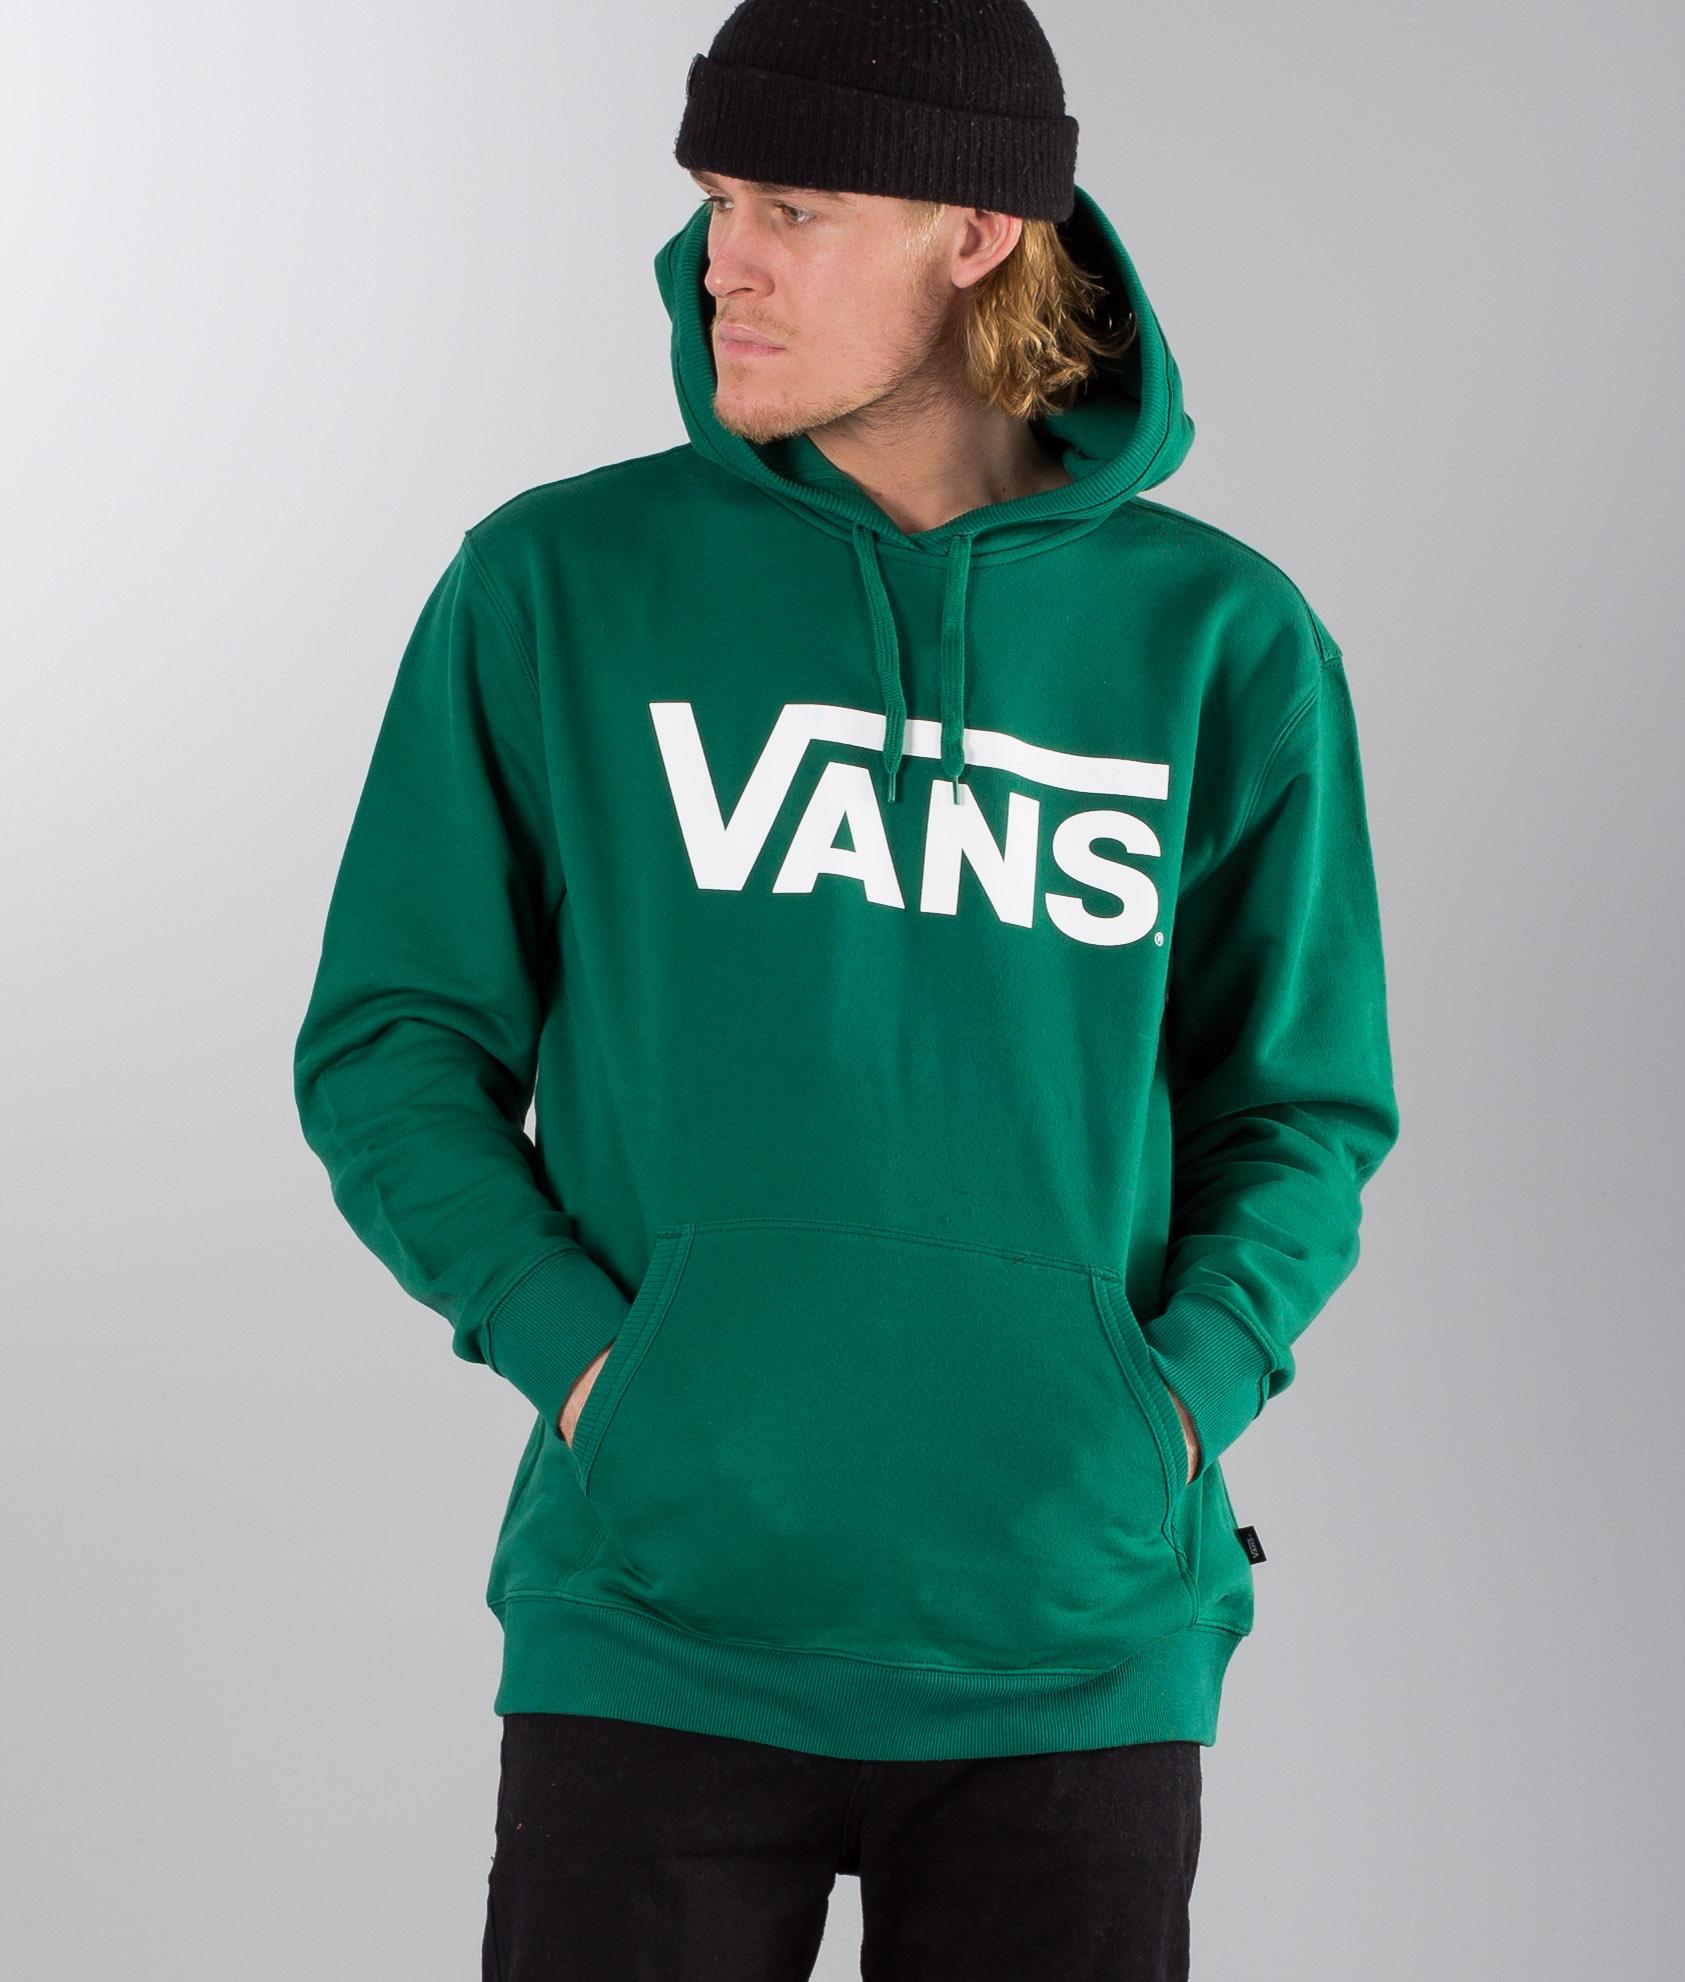 : Vans Classic Pullover Hoodie: VANS: Shoes